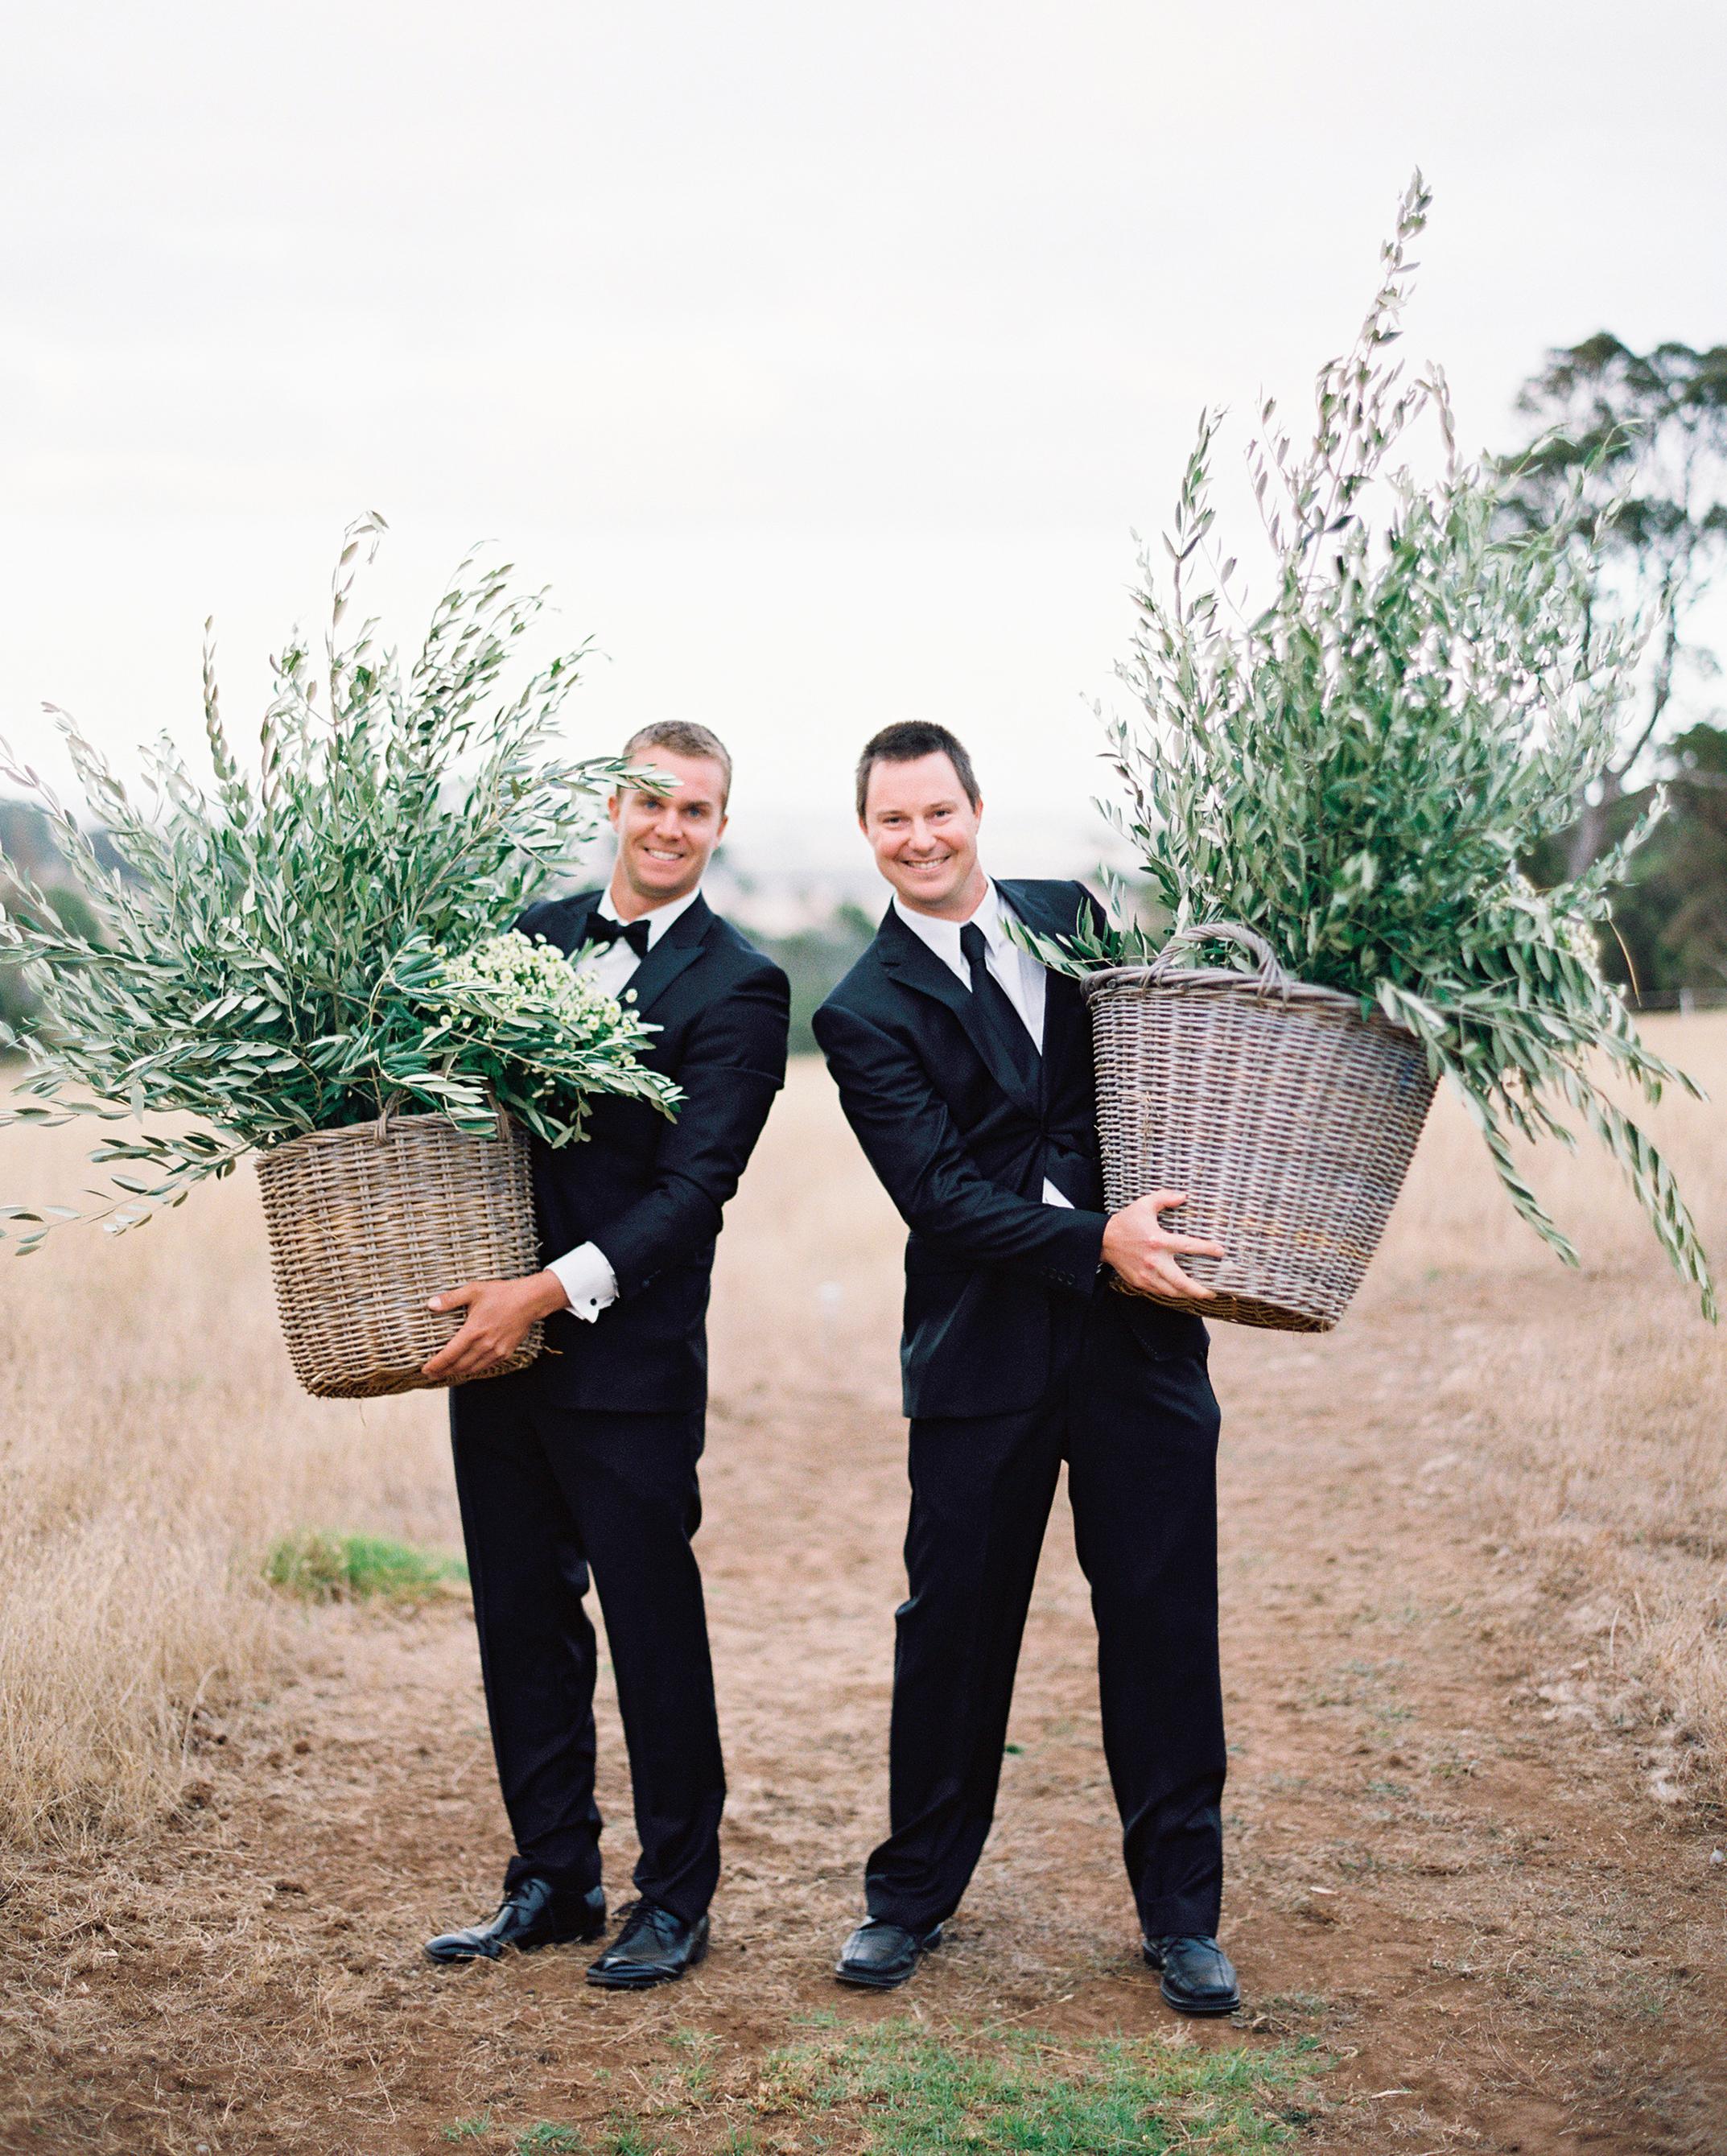 jemma-michael-wedding-buckets-002596004-s112110-0815.jpg